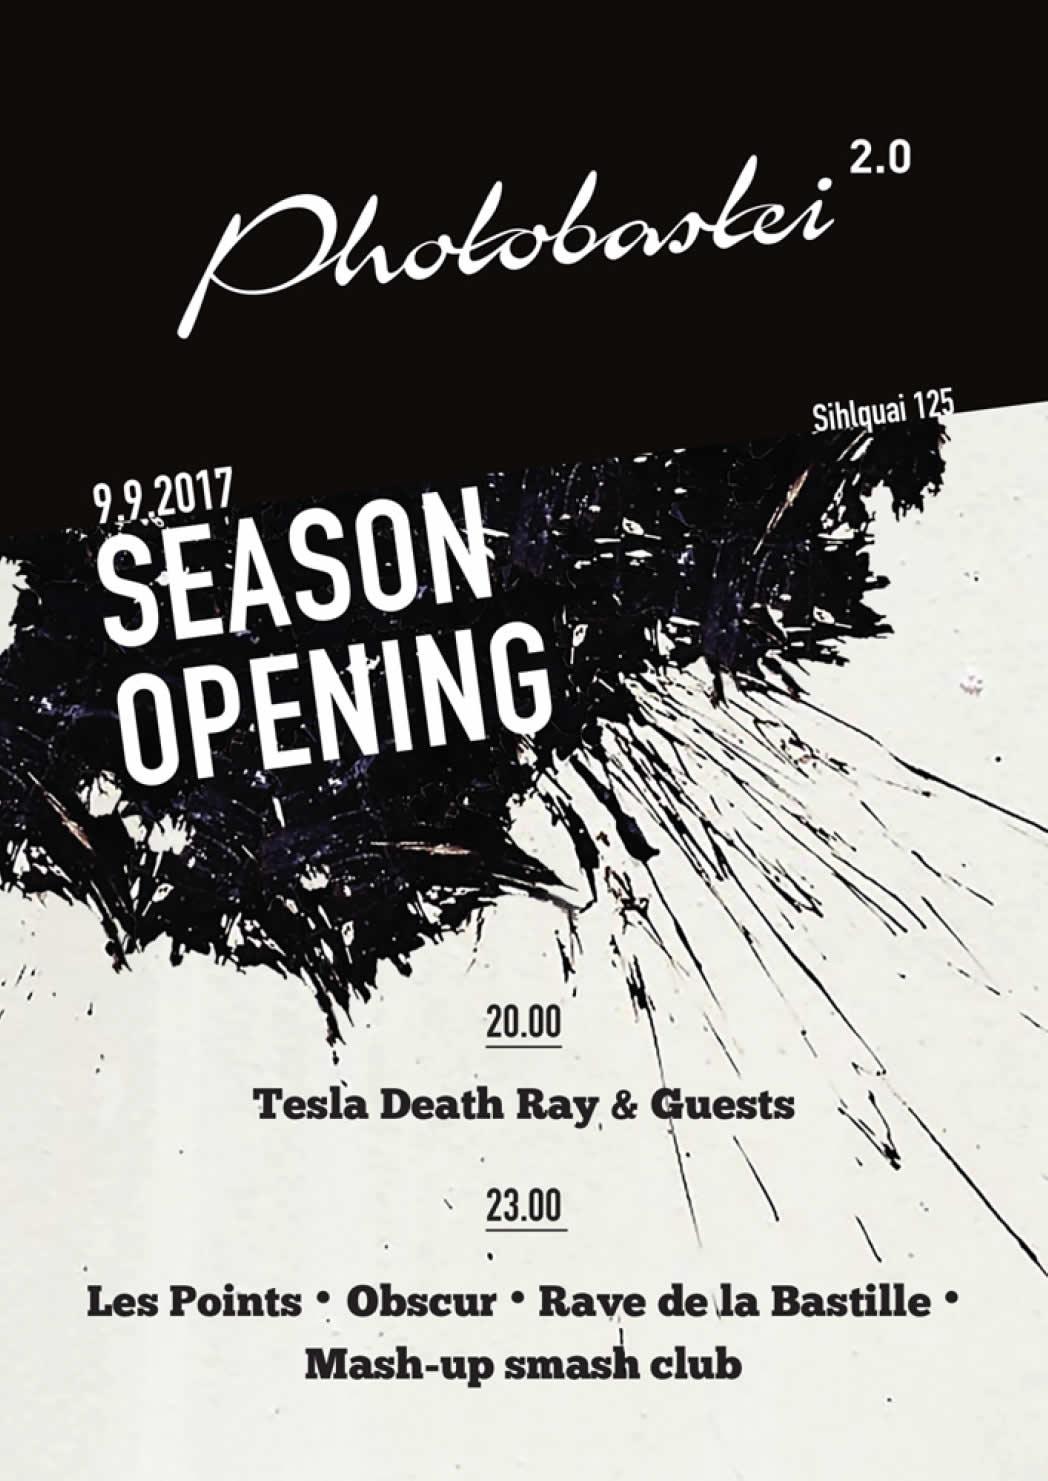 Photobastei 2.0 Pre-Opening